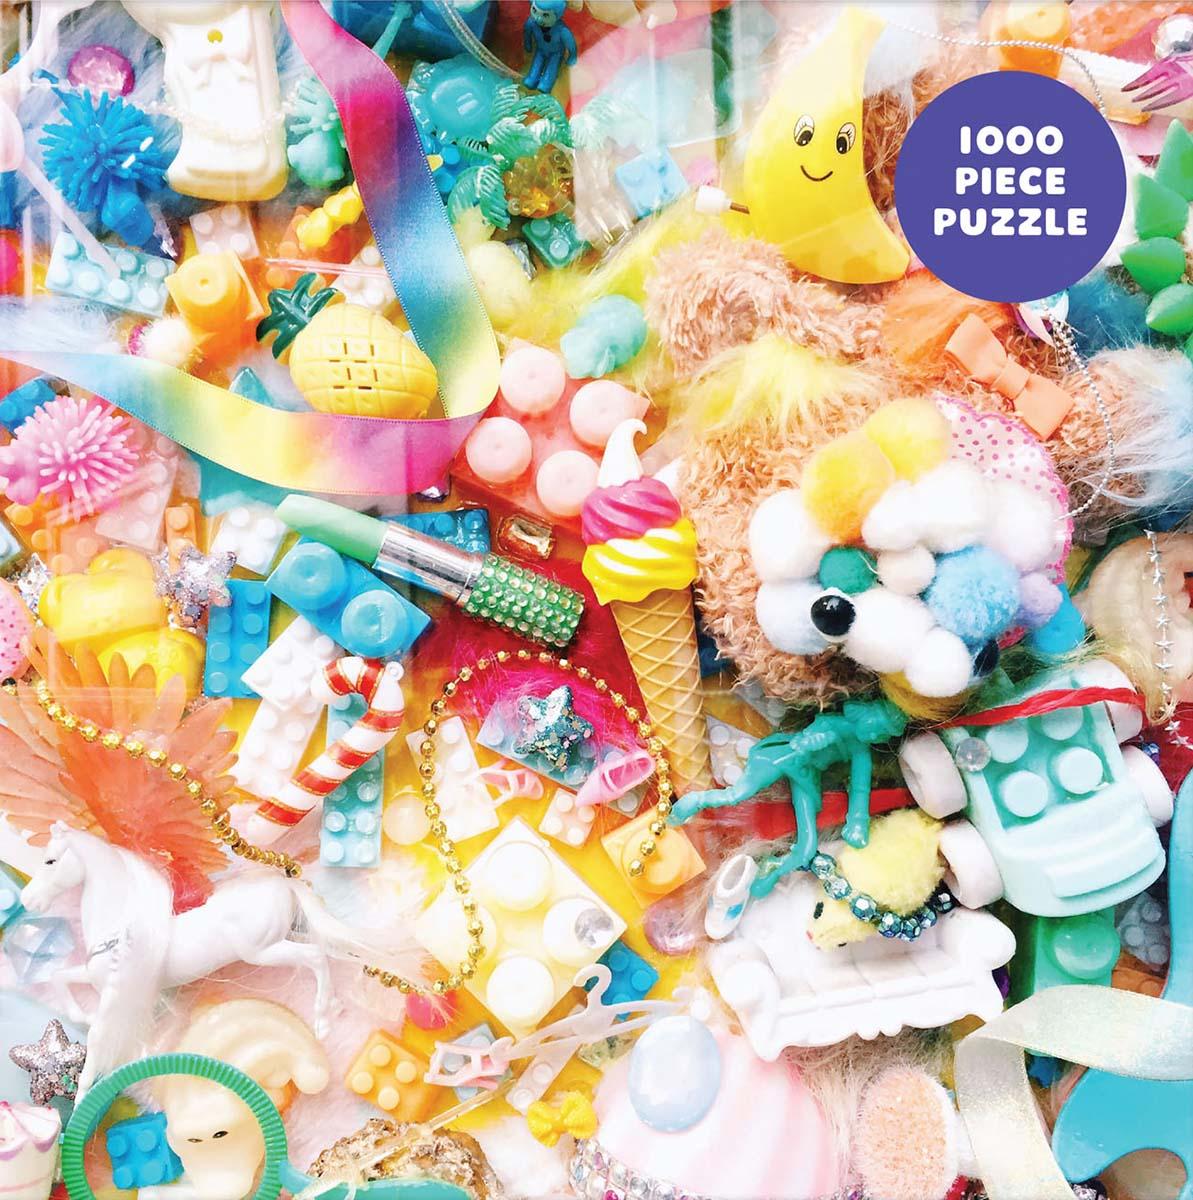 Tokyo Treasures Collage Jigsaw Puzzle